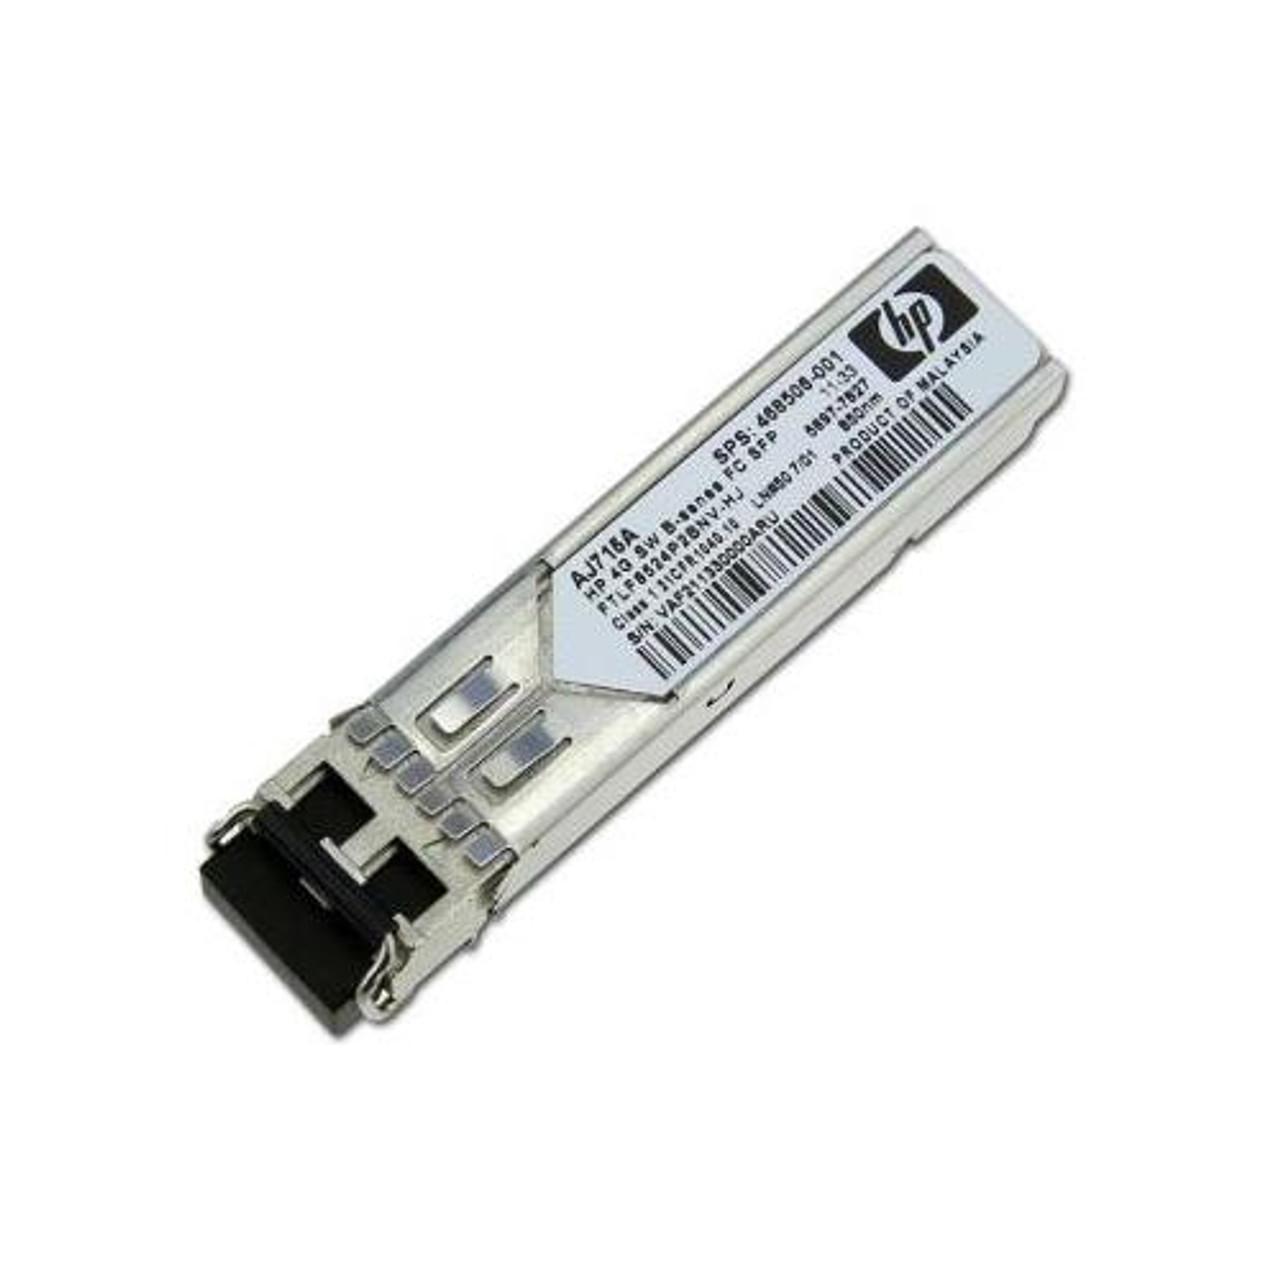 HP AJ715A AJ715-63001 468506-001 Short Wave B-series 1 Pack SFP Transceiver